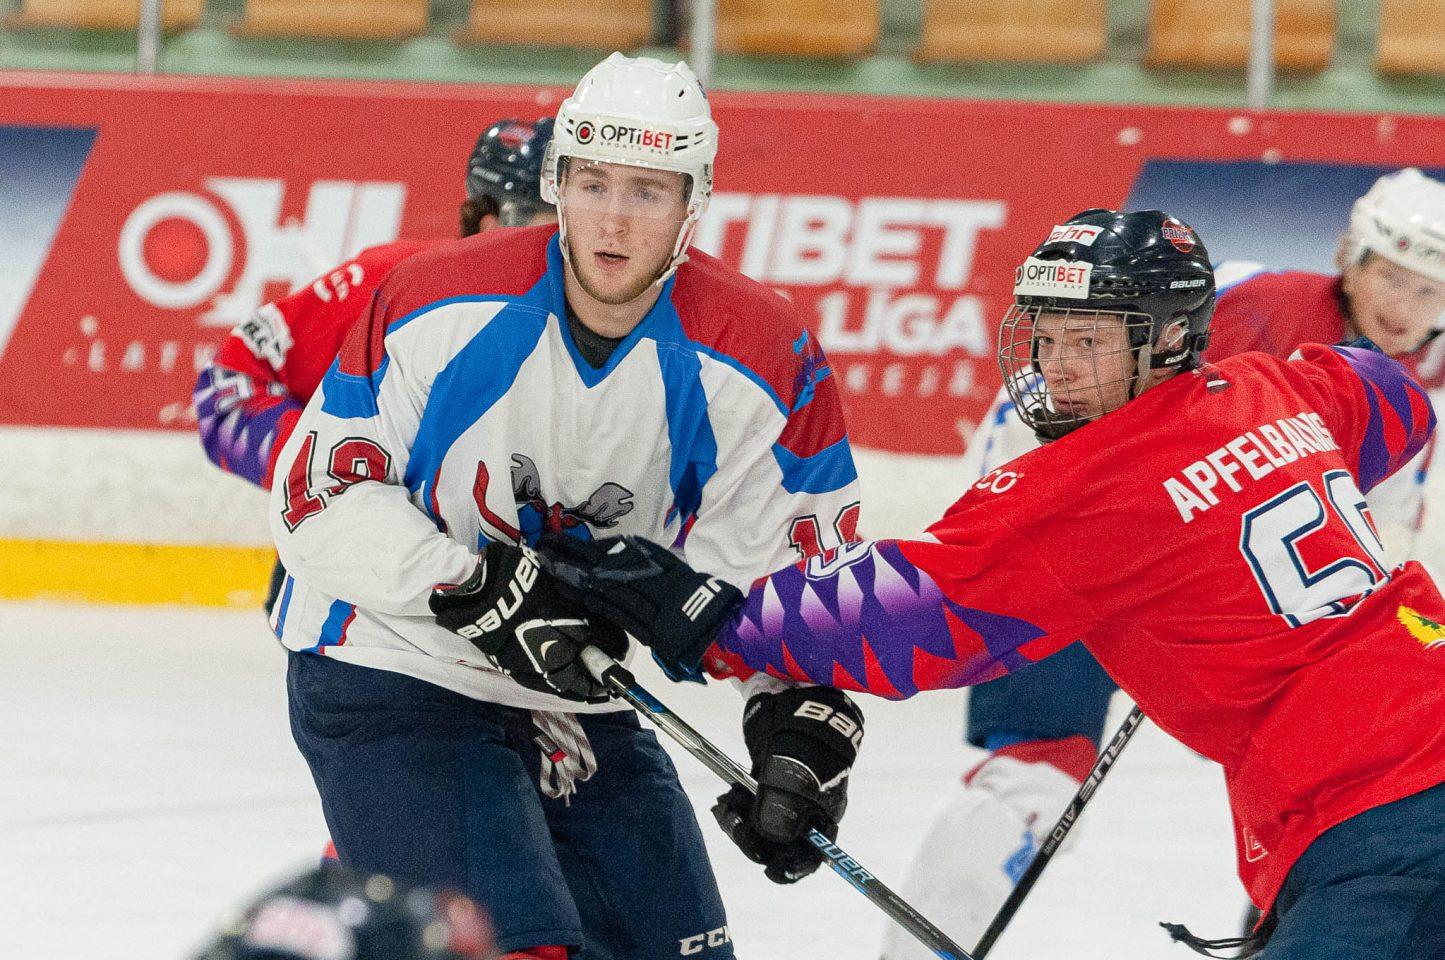 Hokejists ar roku kavē pretinieku